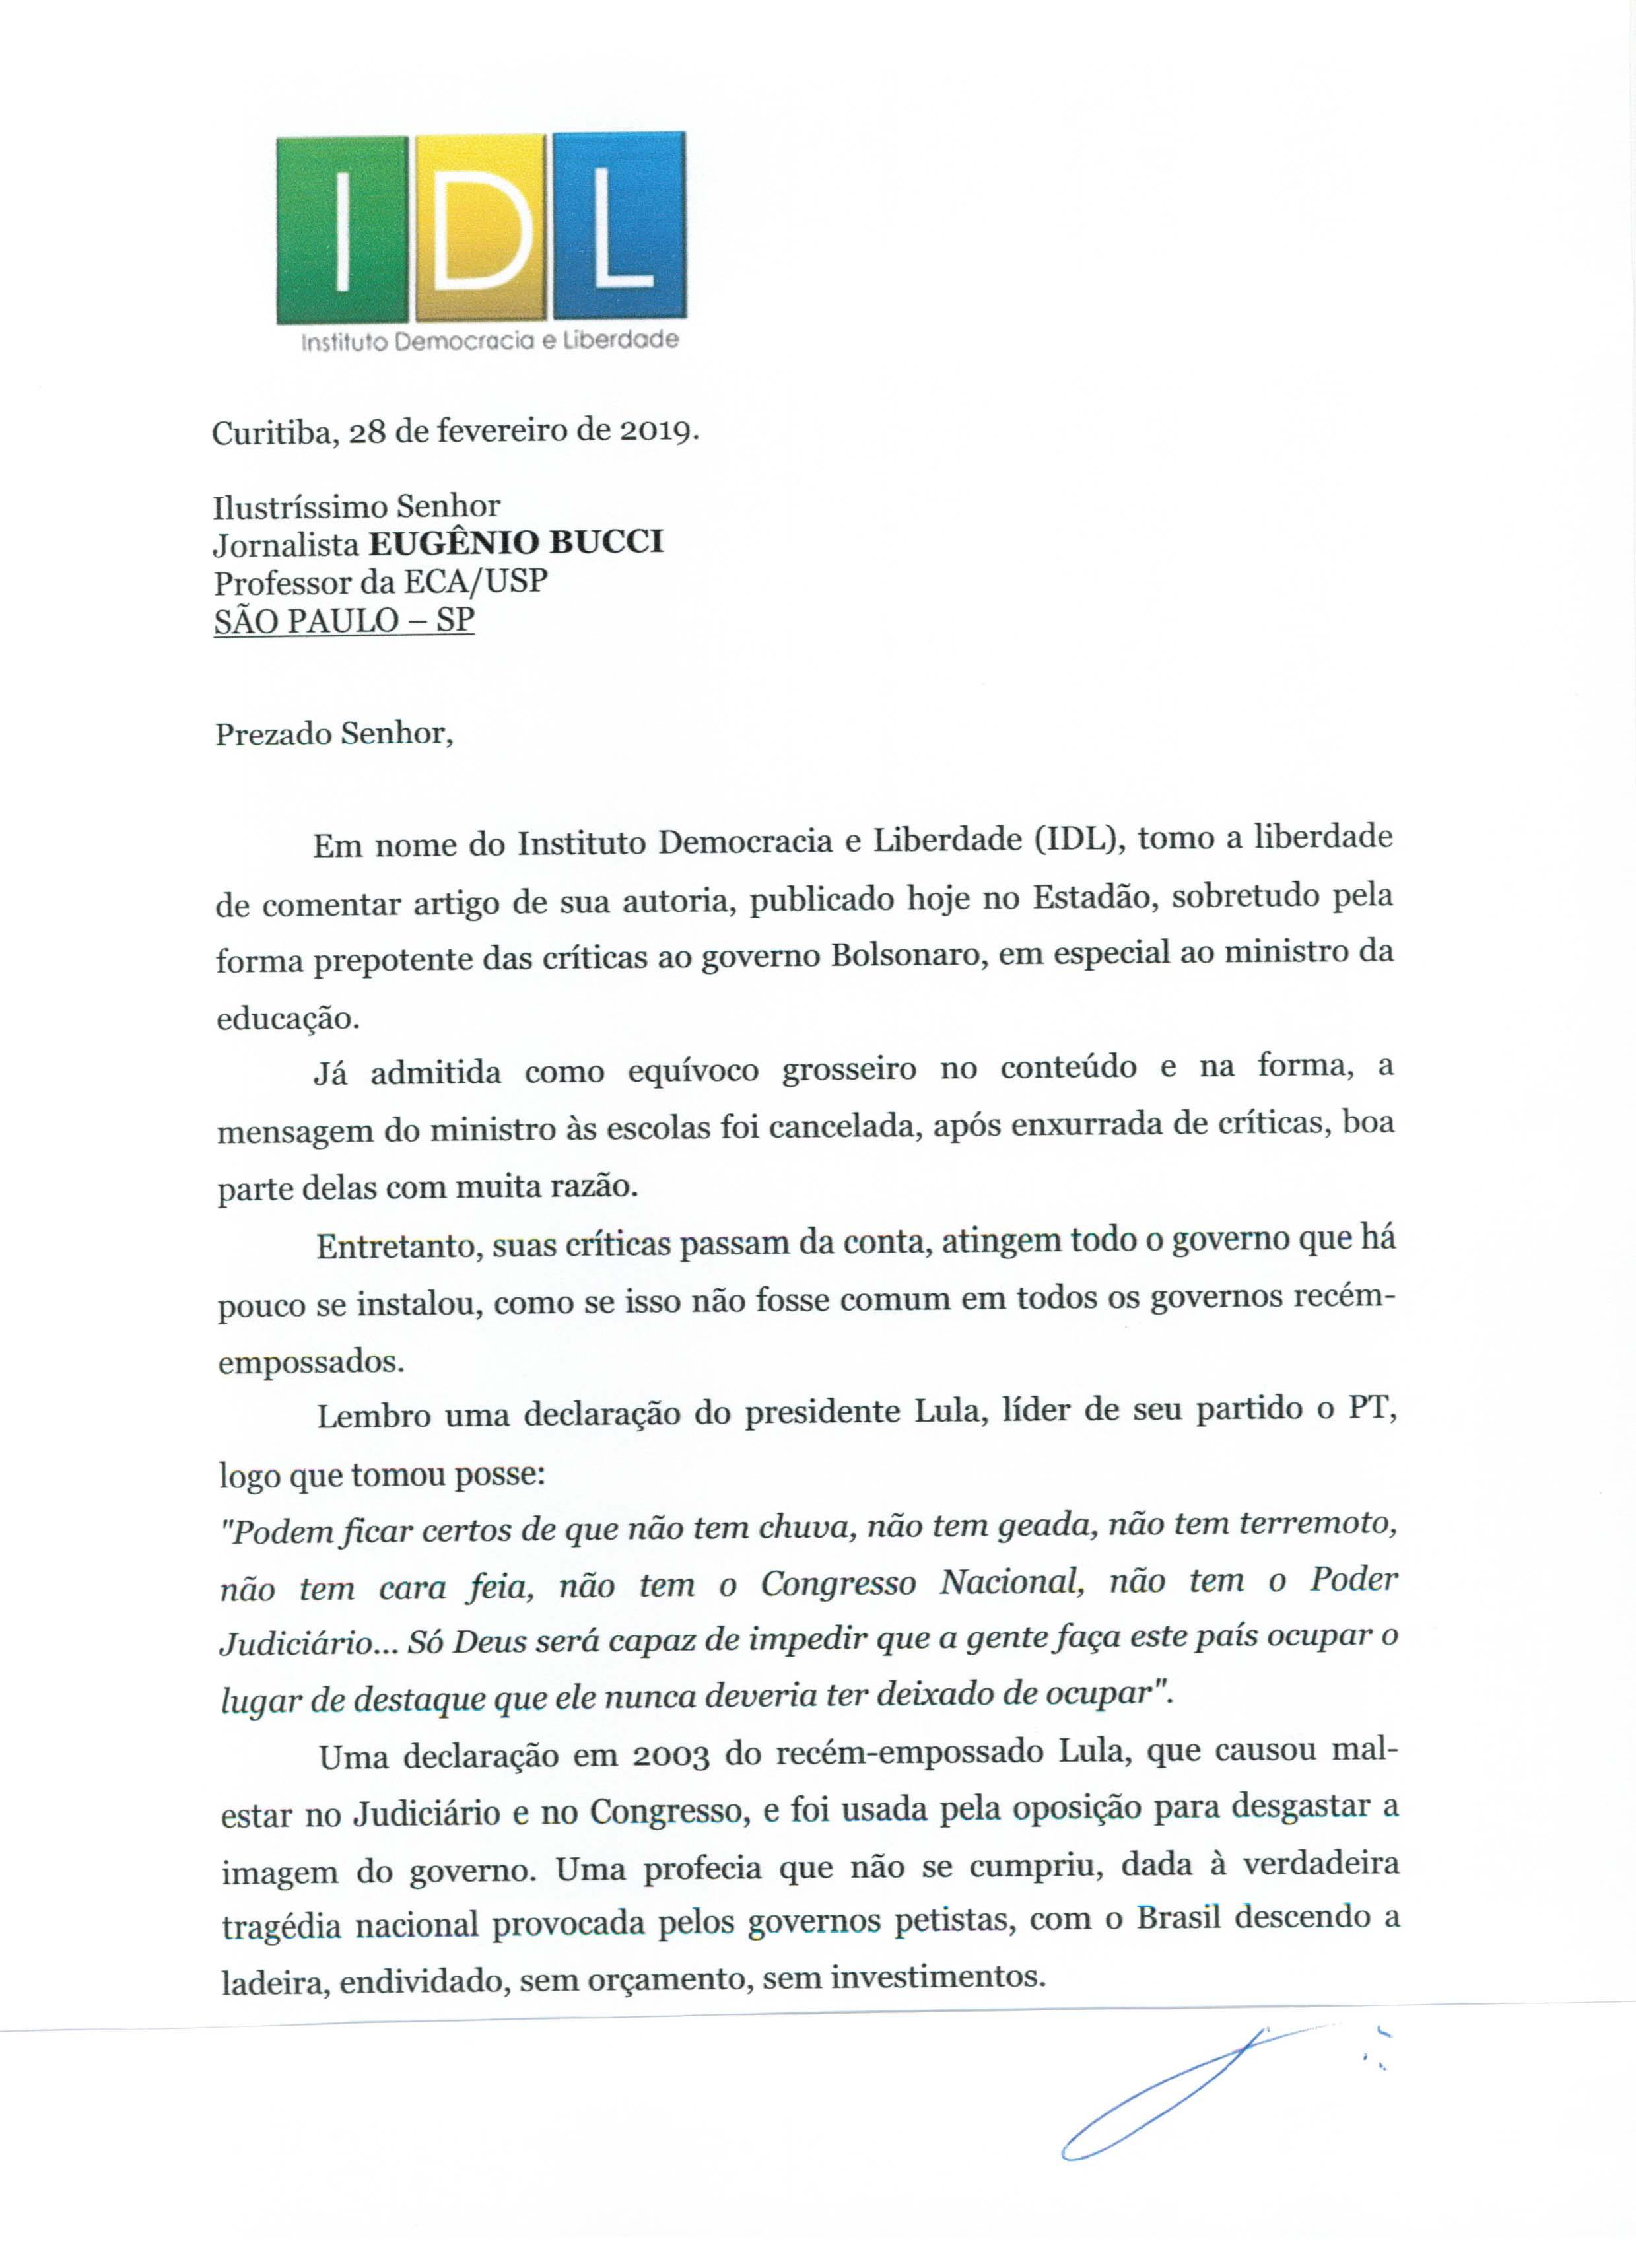 JORNALISTA EUGÊNIO BUCCI-1